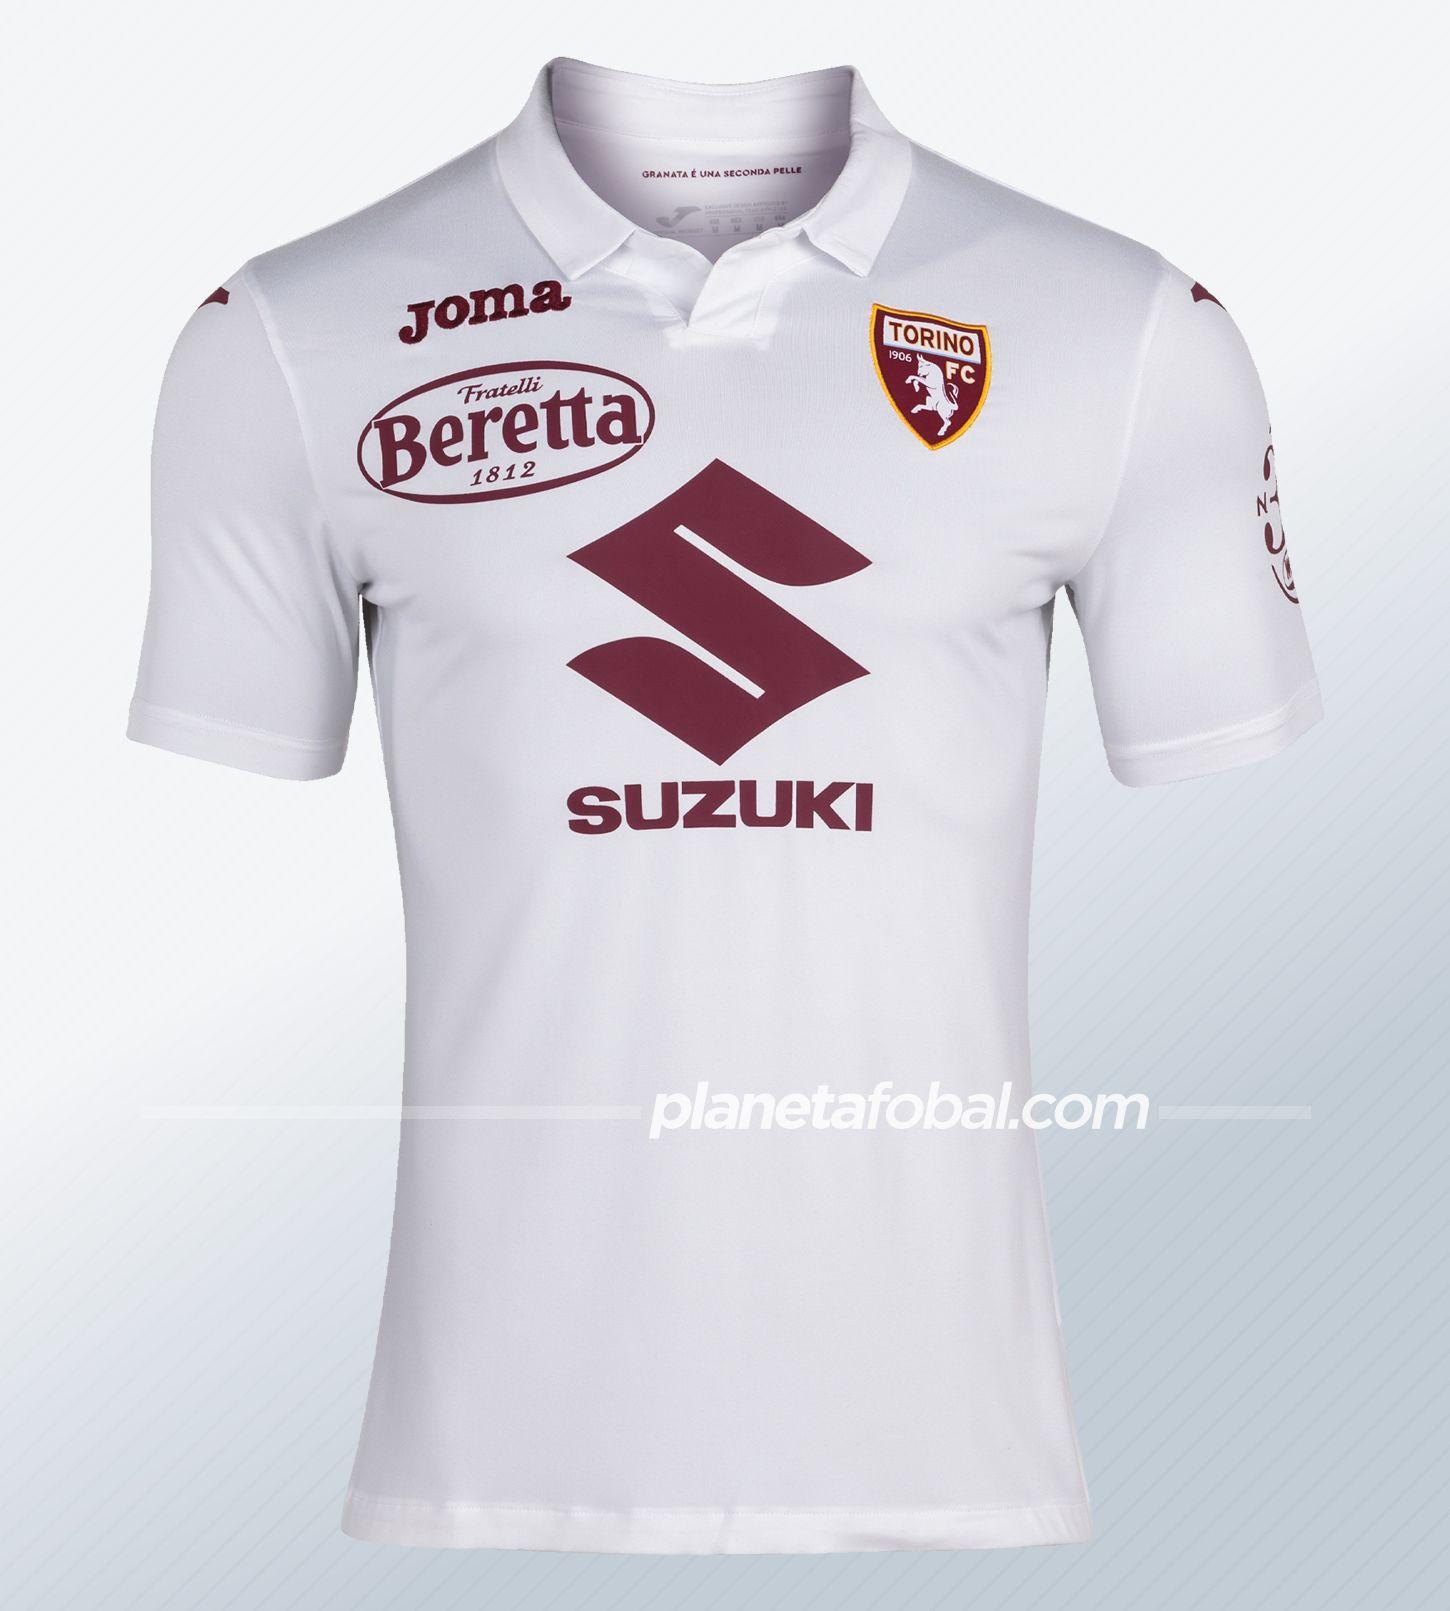 Cmisetas Joma del Torino 2020/21 | Imagen Twitter Oficial